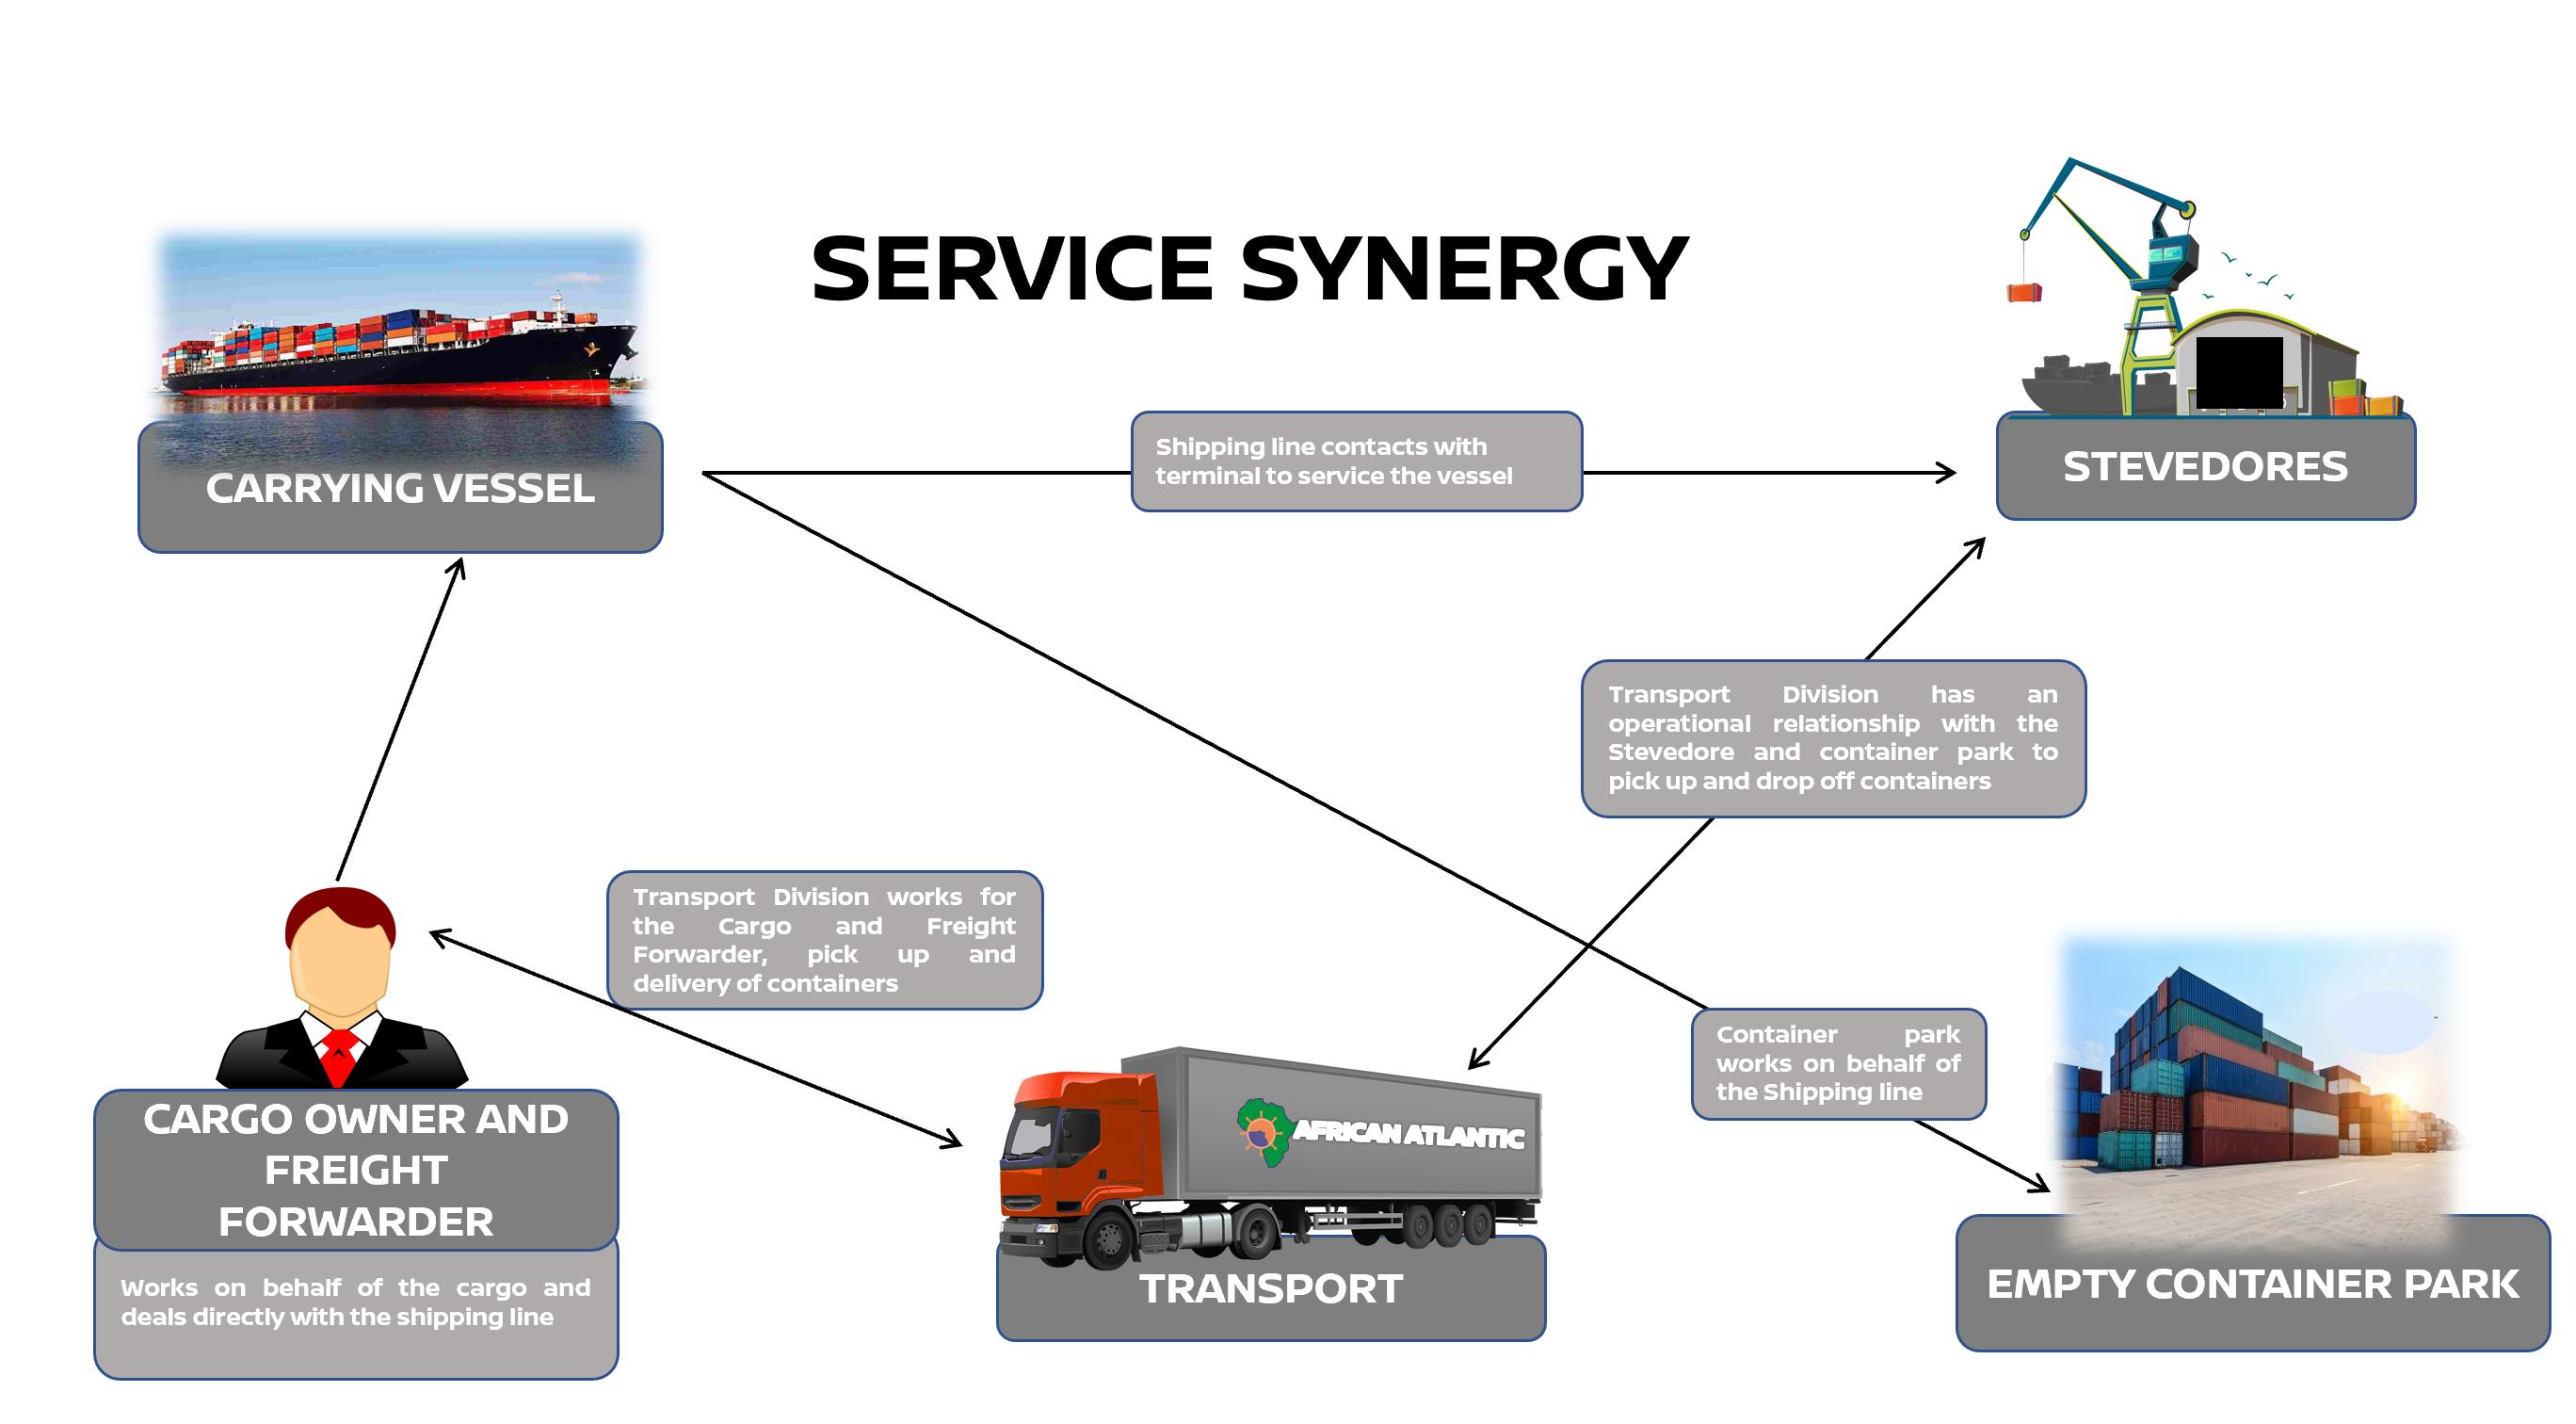 Service Synergy